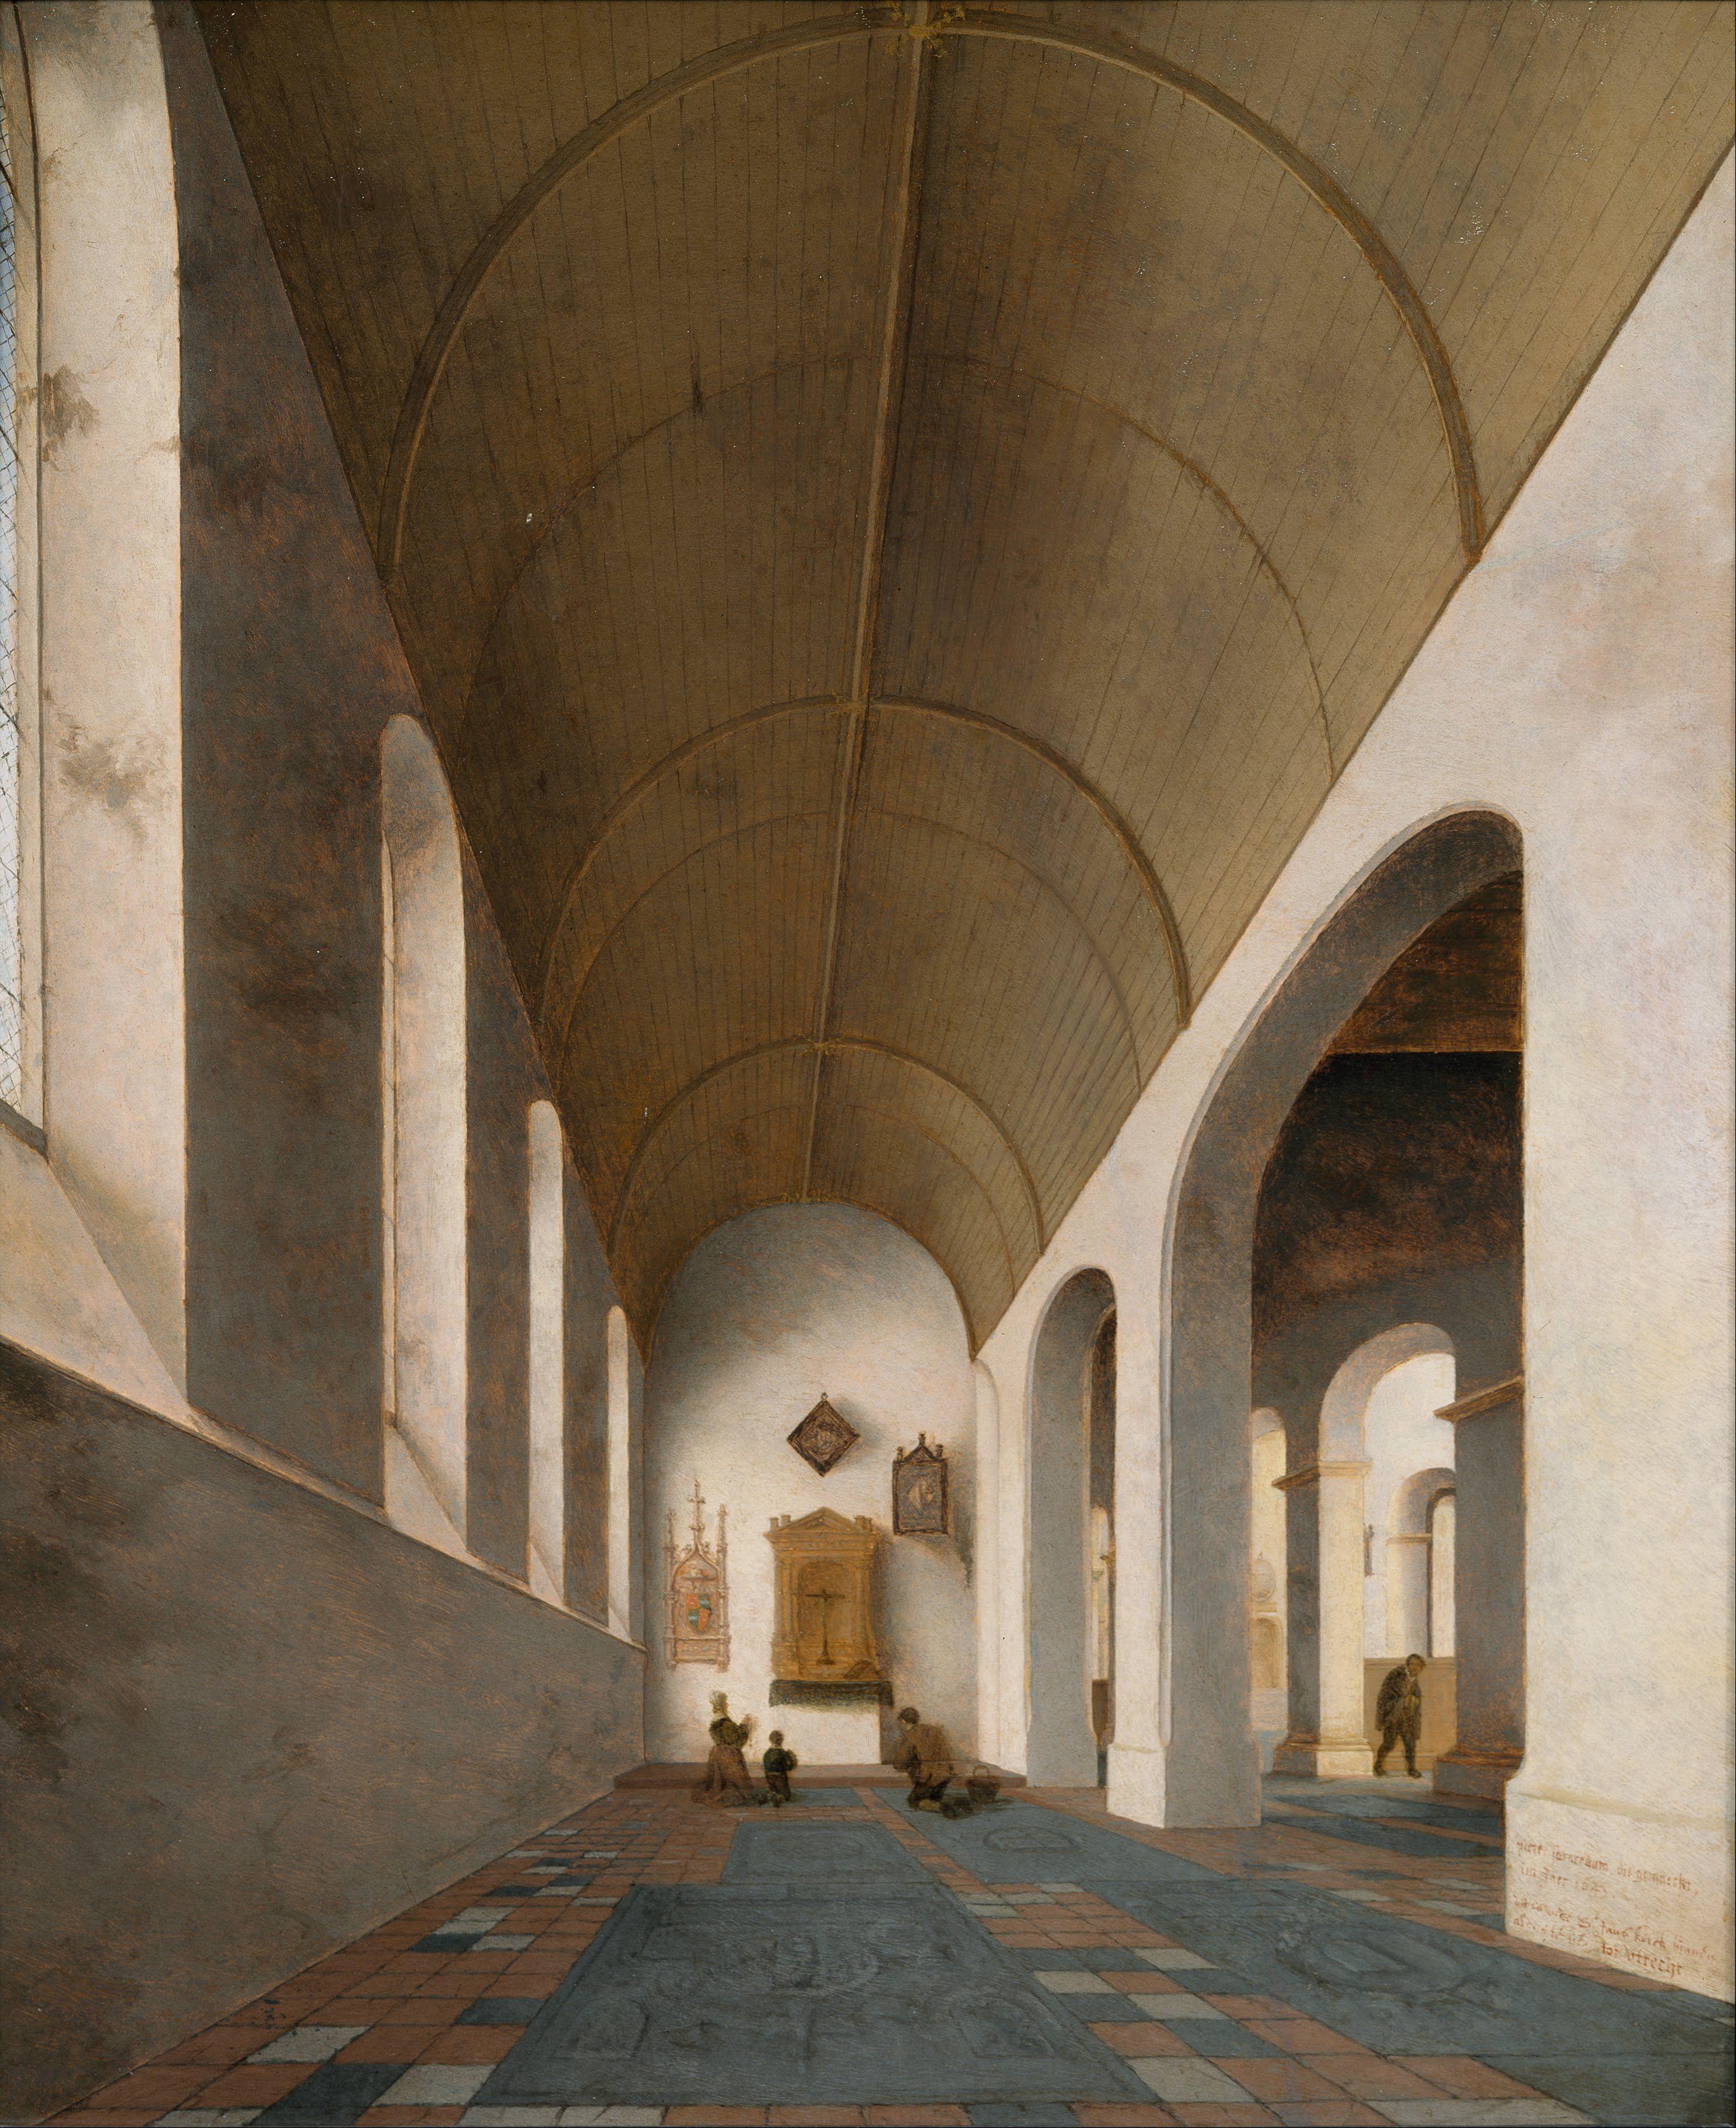 Pieter_Jansz._Saenredam_-_St_Antoniuskapel_in_the_St_Janskerk,_Utrecht_-_Google_Art_Project.jpg (2977×3649)